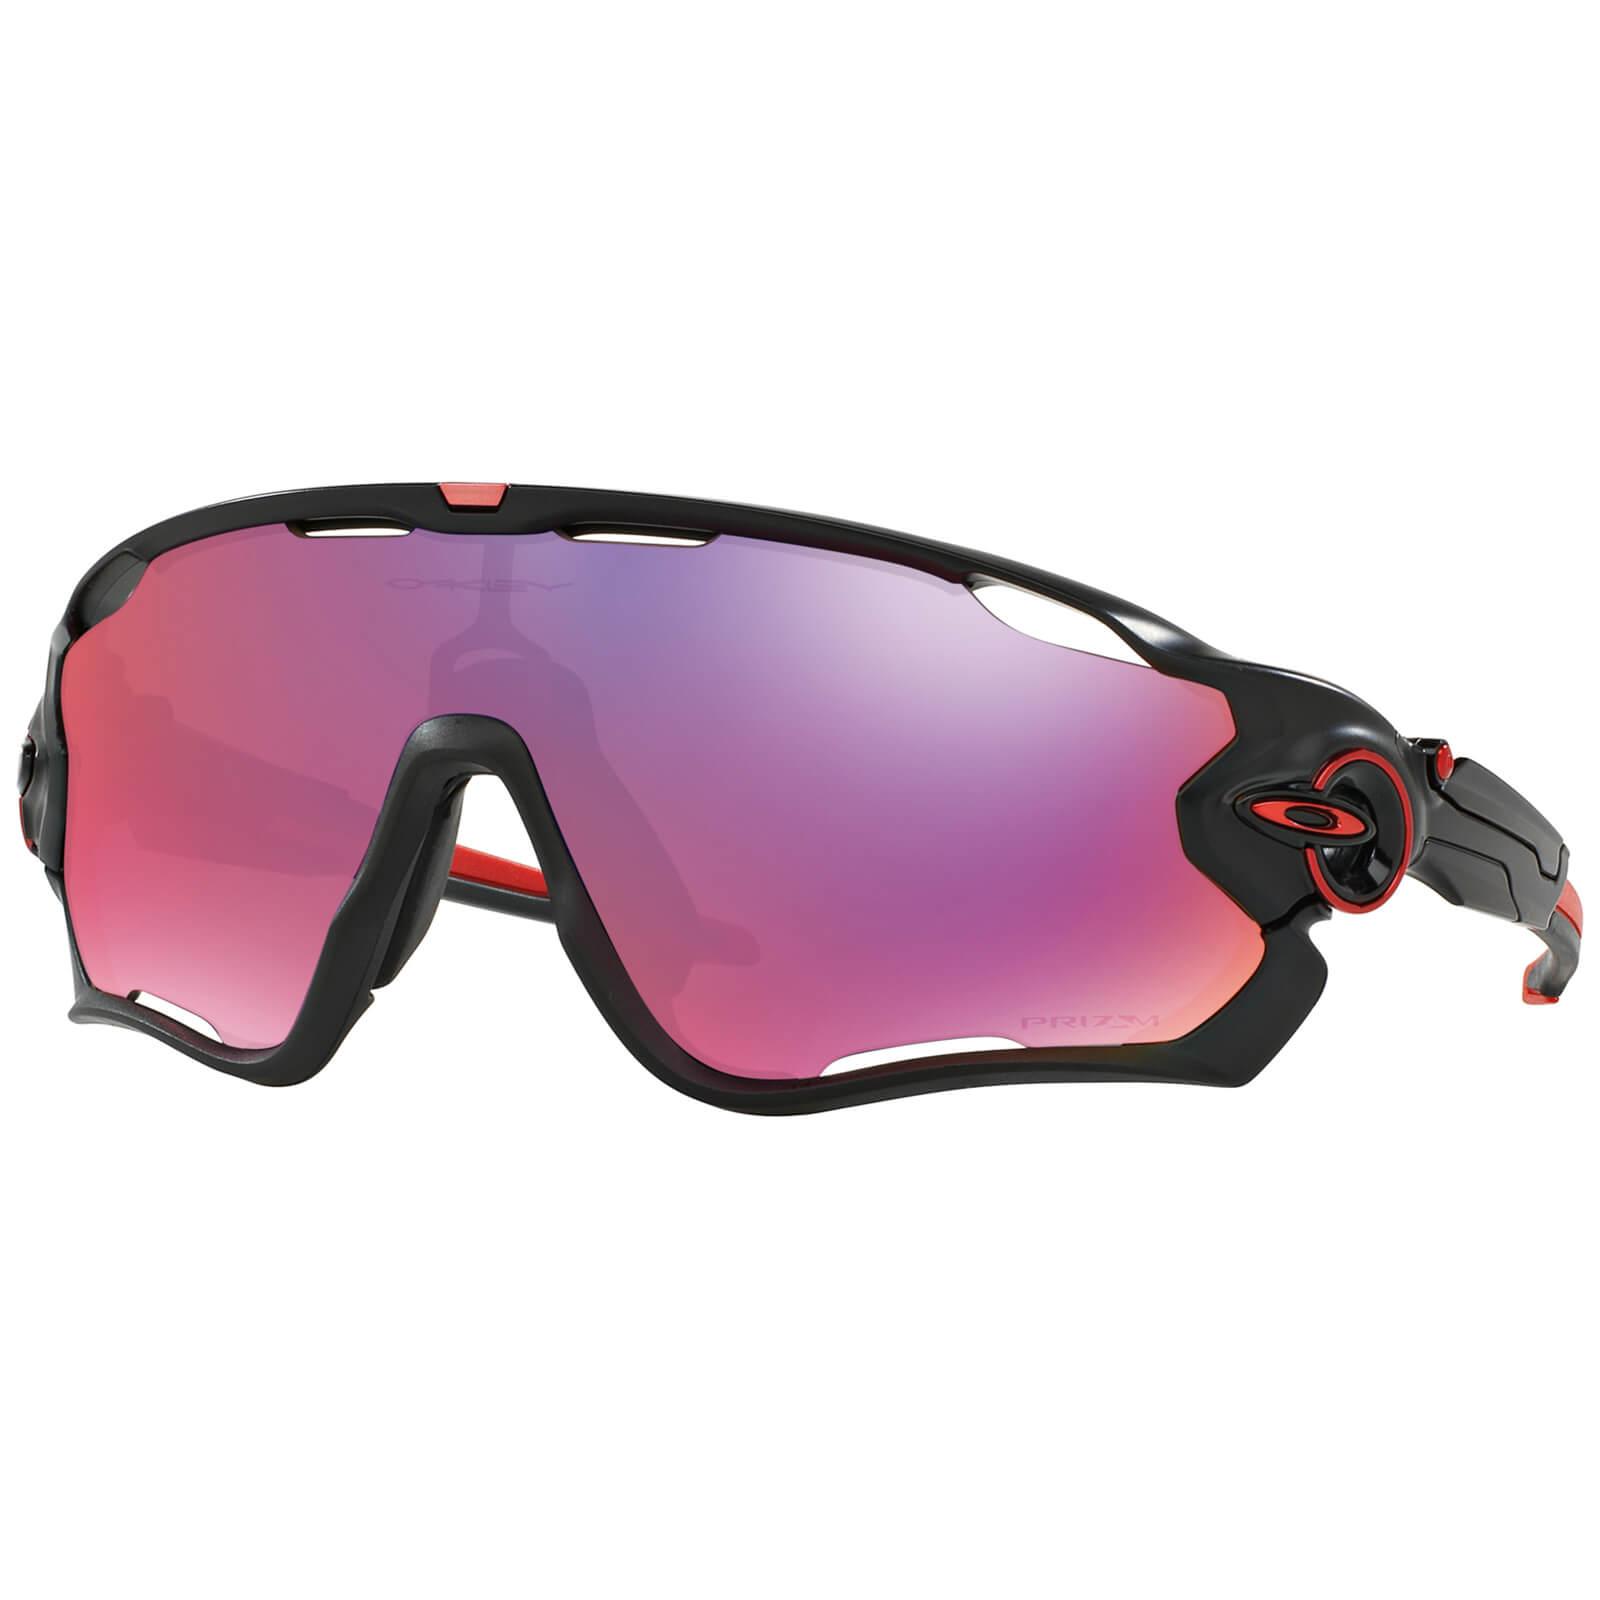 Oakley Jawbreaker Sunglasses - Matte Black/Prizm Road